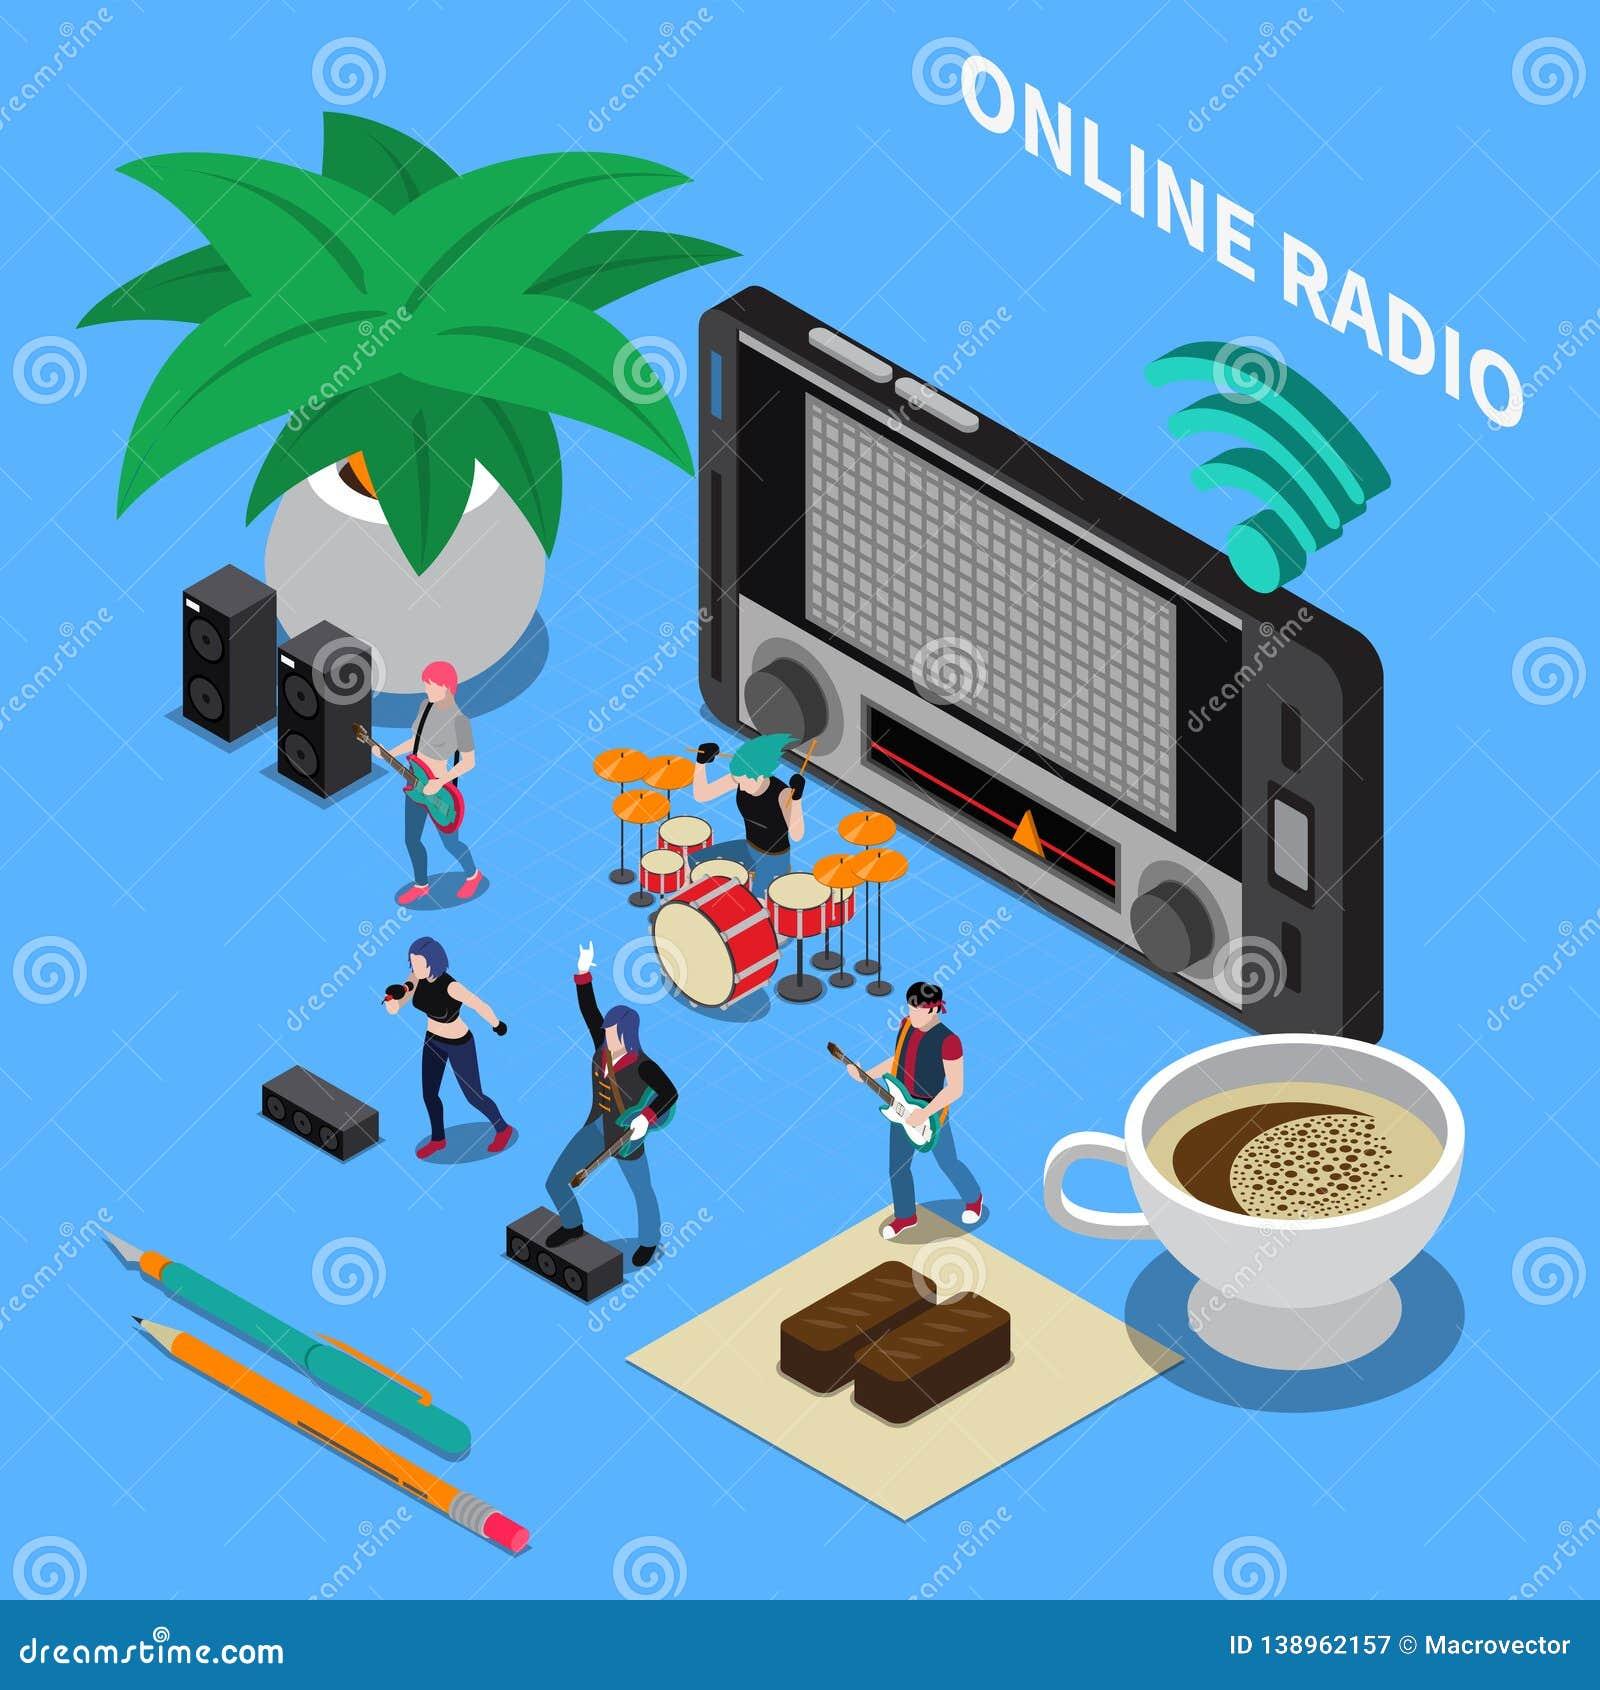 Online Radio Isometric Composition Stock Vector - Illustration of